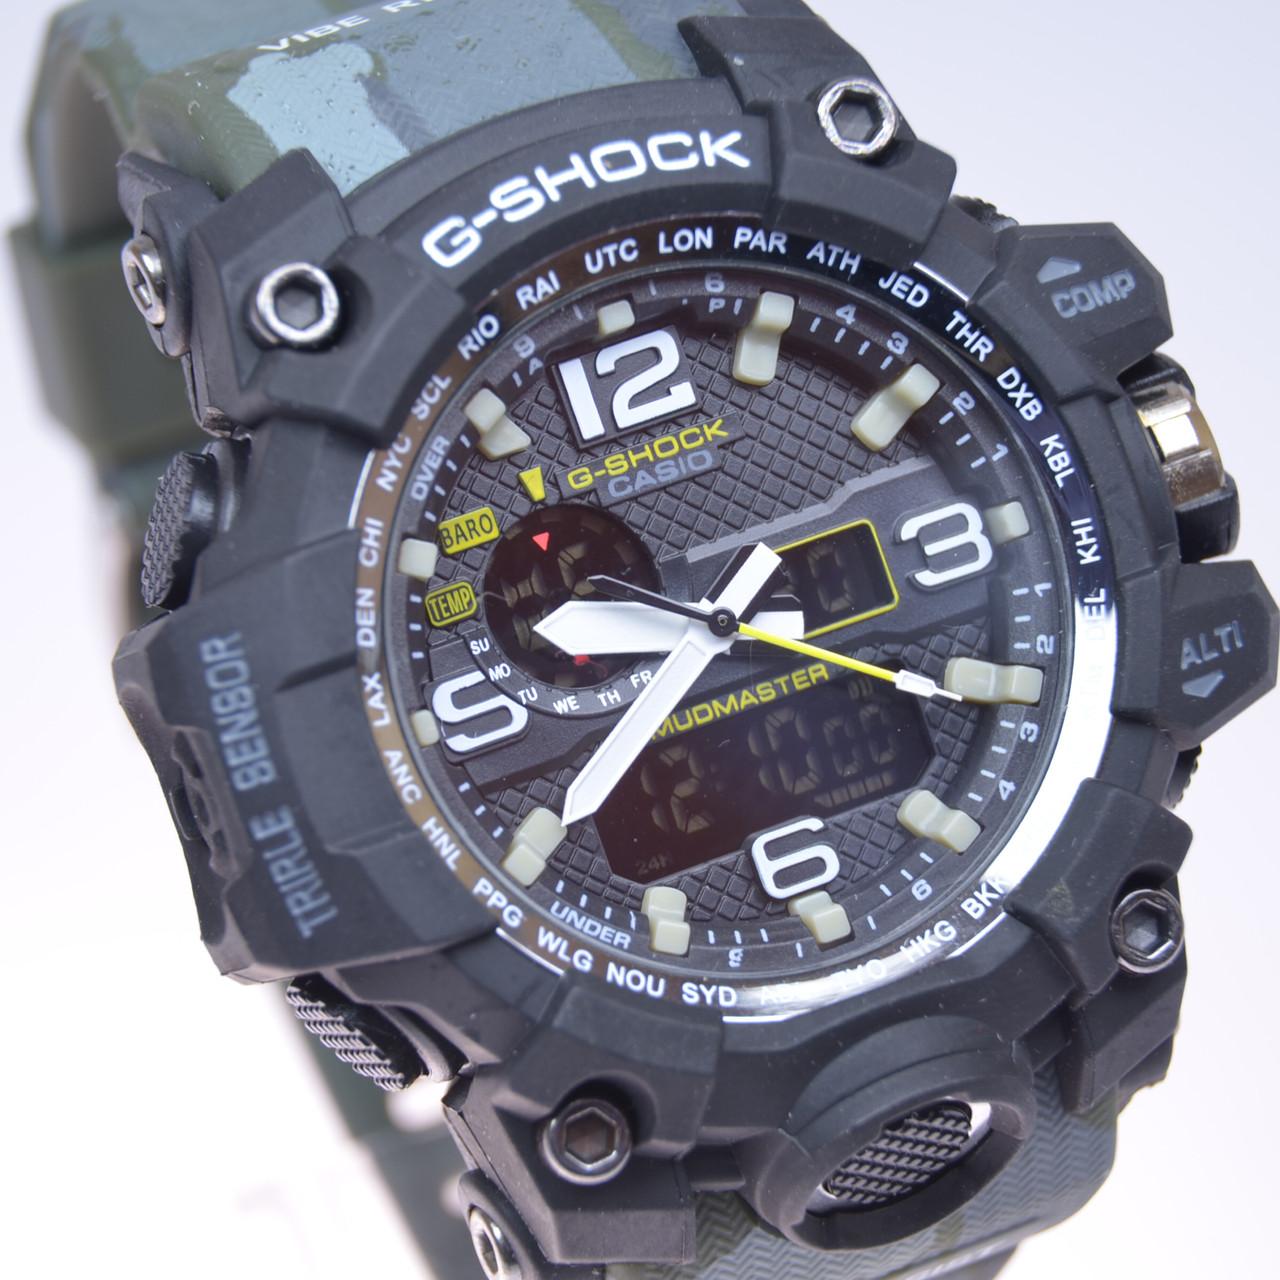 daa6cb1c ... фото Мужские наручные часы Casio G-SHOCK CPW-1000 камуфляж (копия), ...